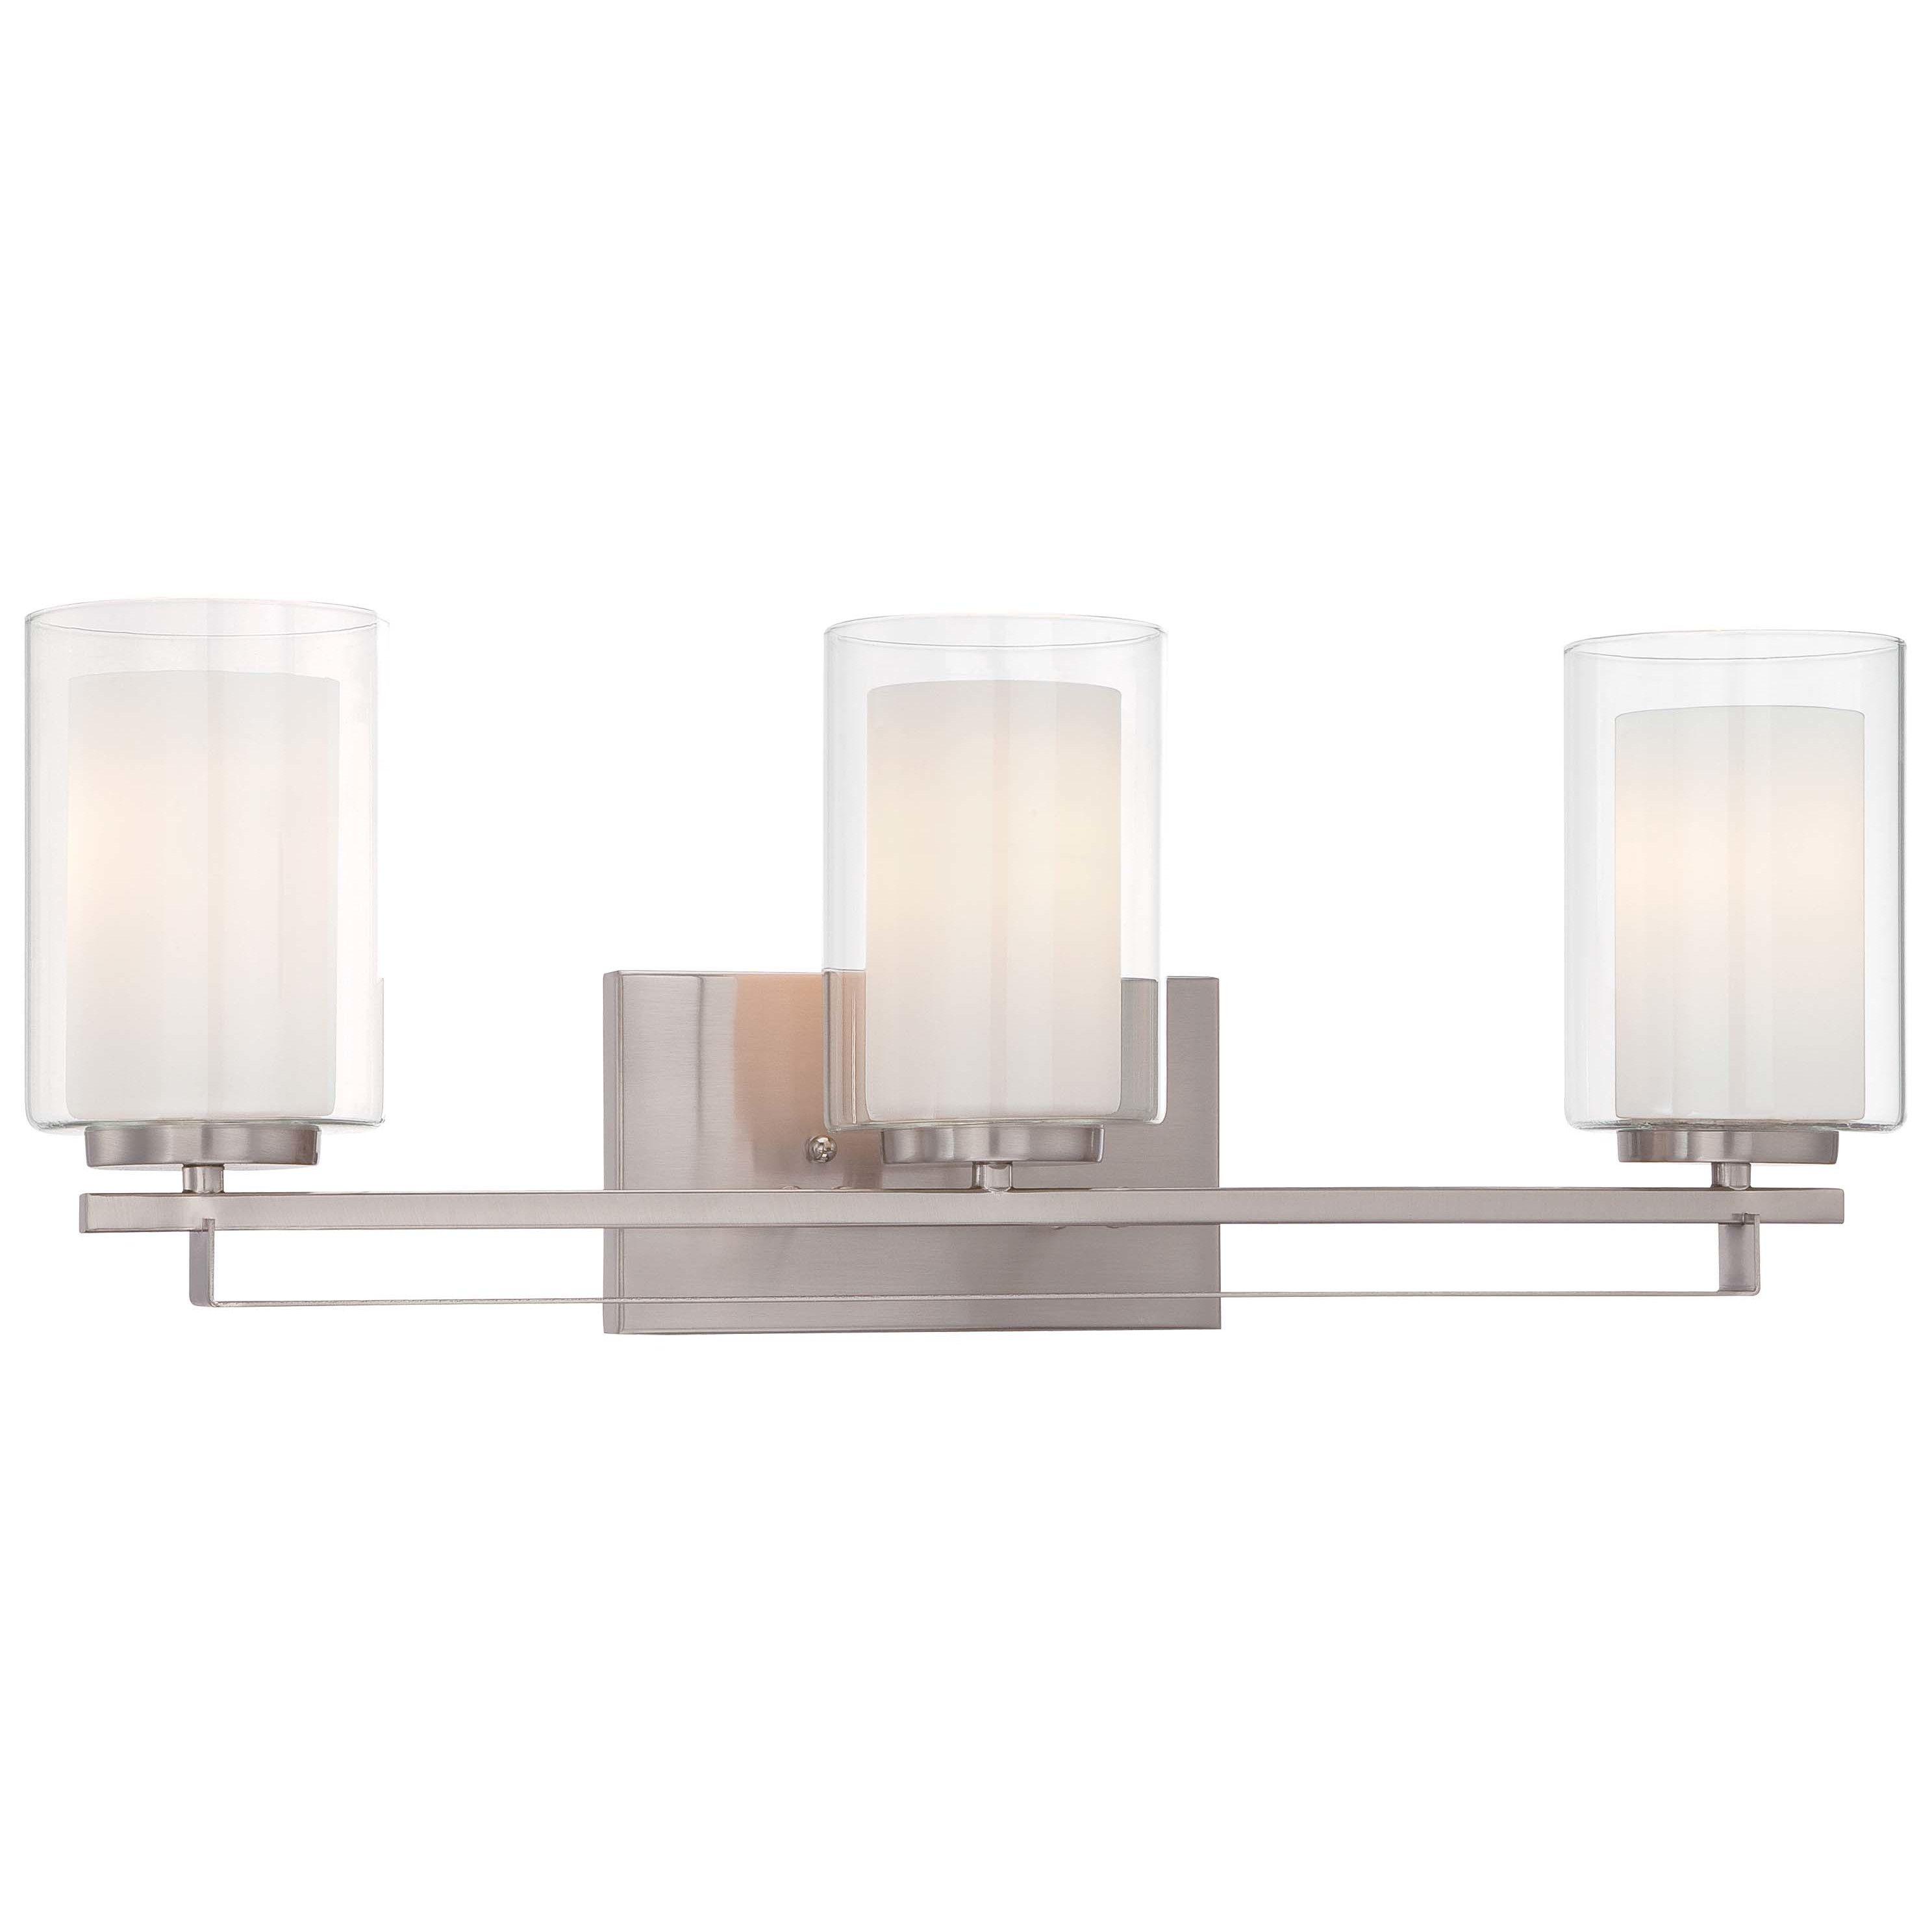 Minka Lavery Parsons Studio 3 Light Vanity Light  Basement Best Minka Lavery Bathroom Lighting Review